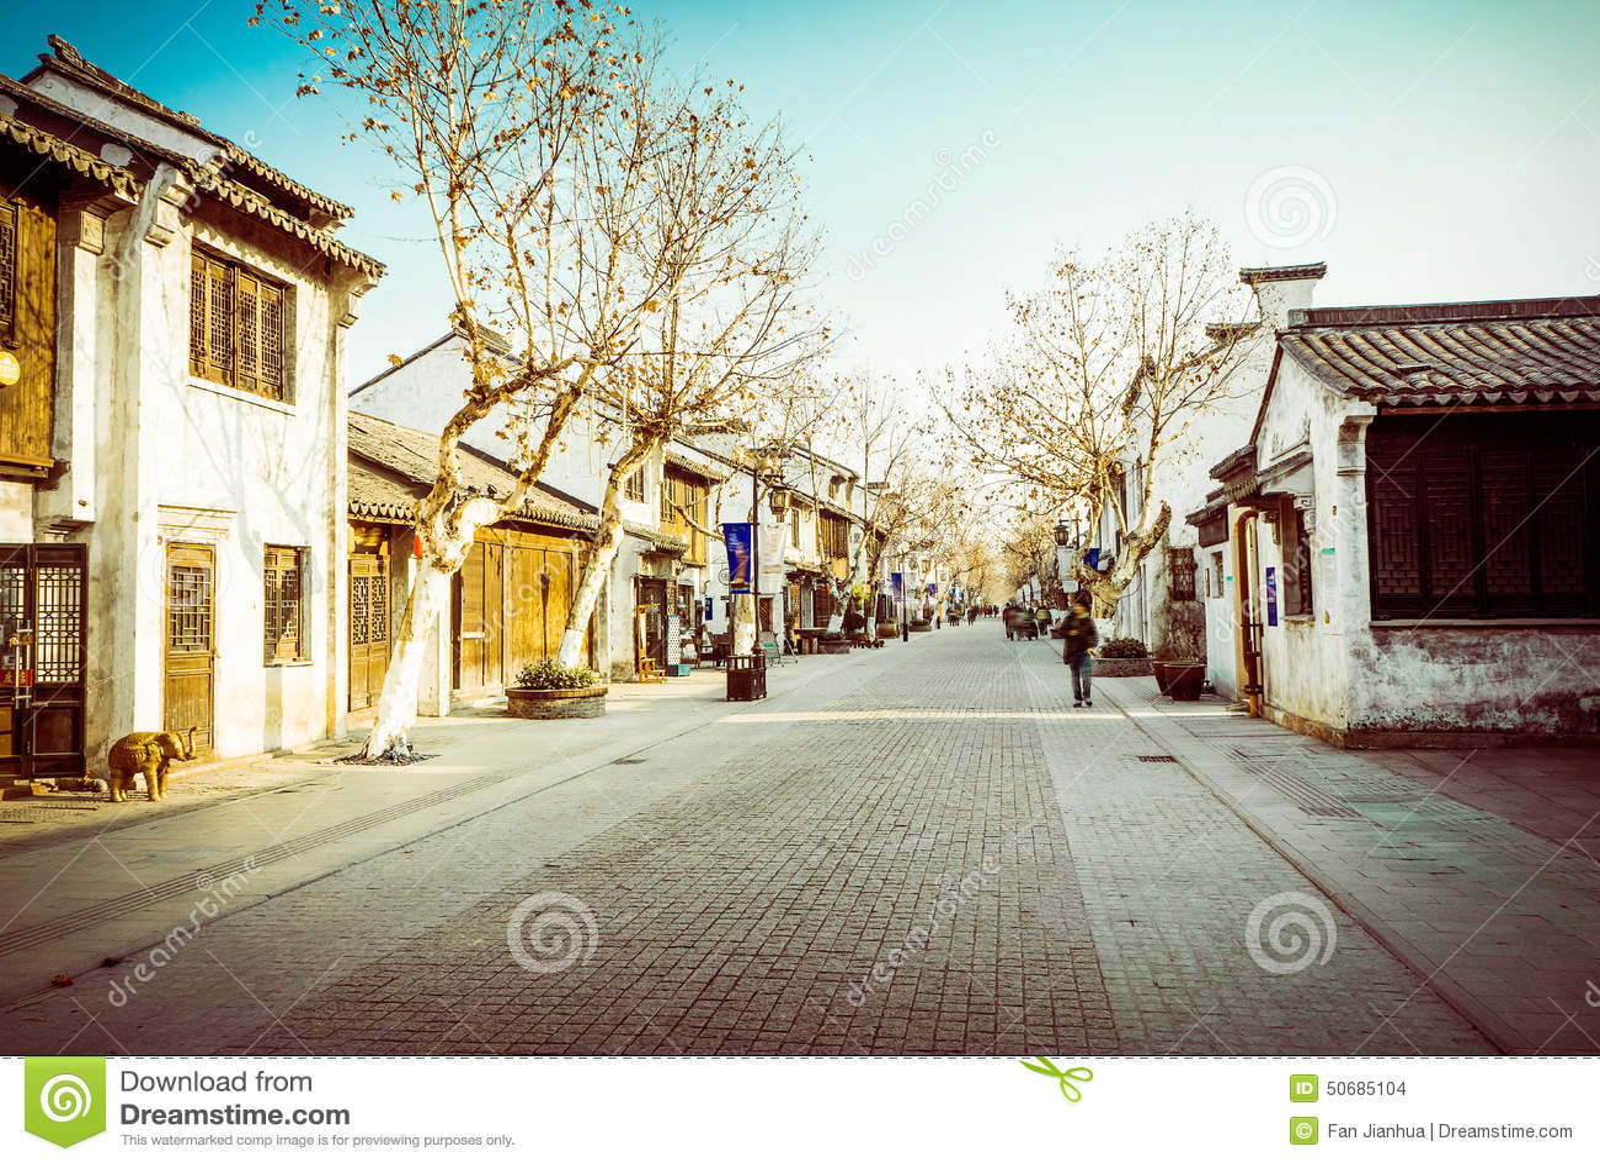 Download 无锡惠山镇街 库存照片. 图片 包括有 石头, 购物, 游人, 反气旋, 休闲, 传统, 村庄, 著名, 地点 - 50685104